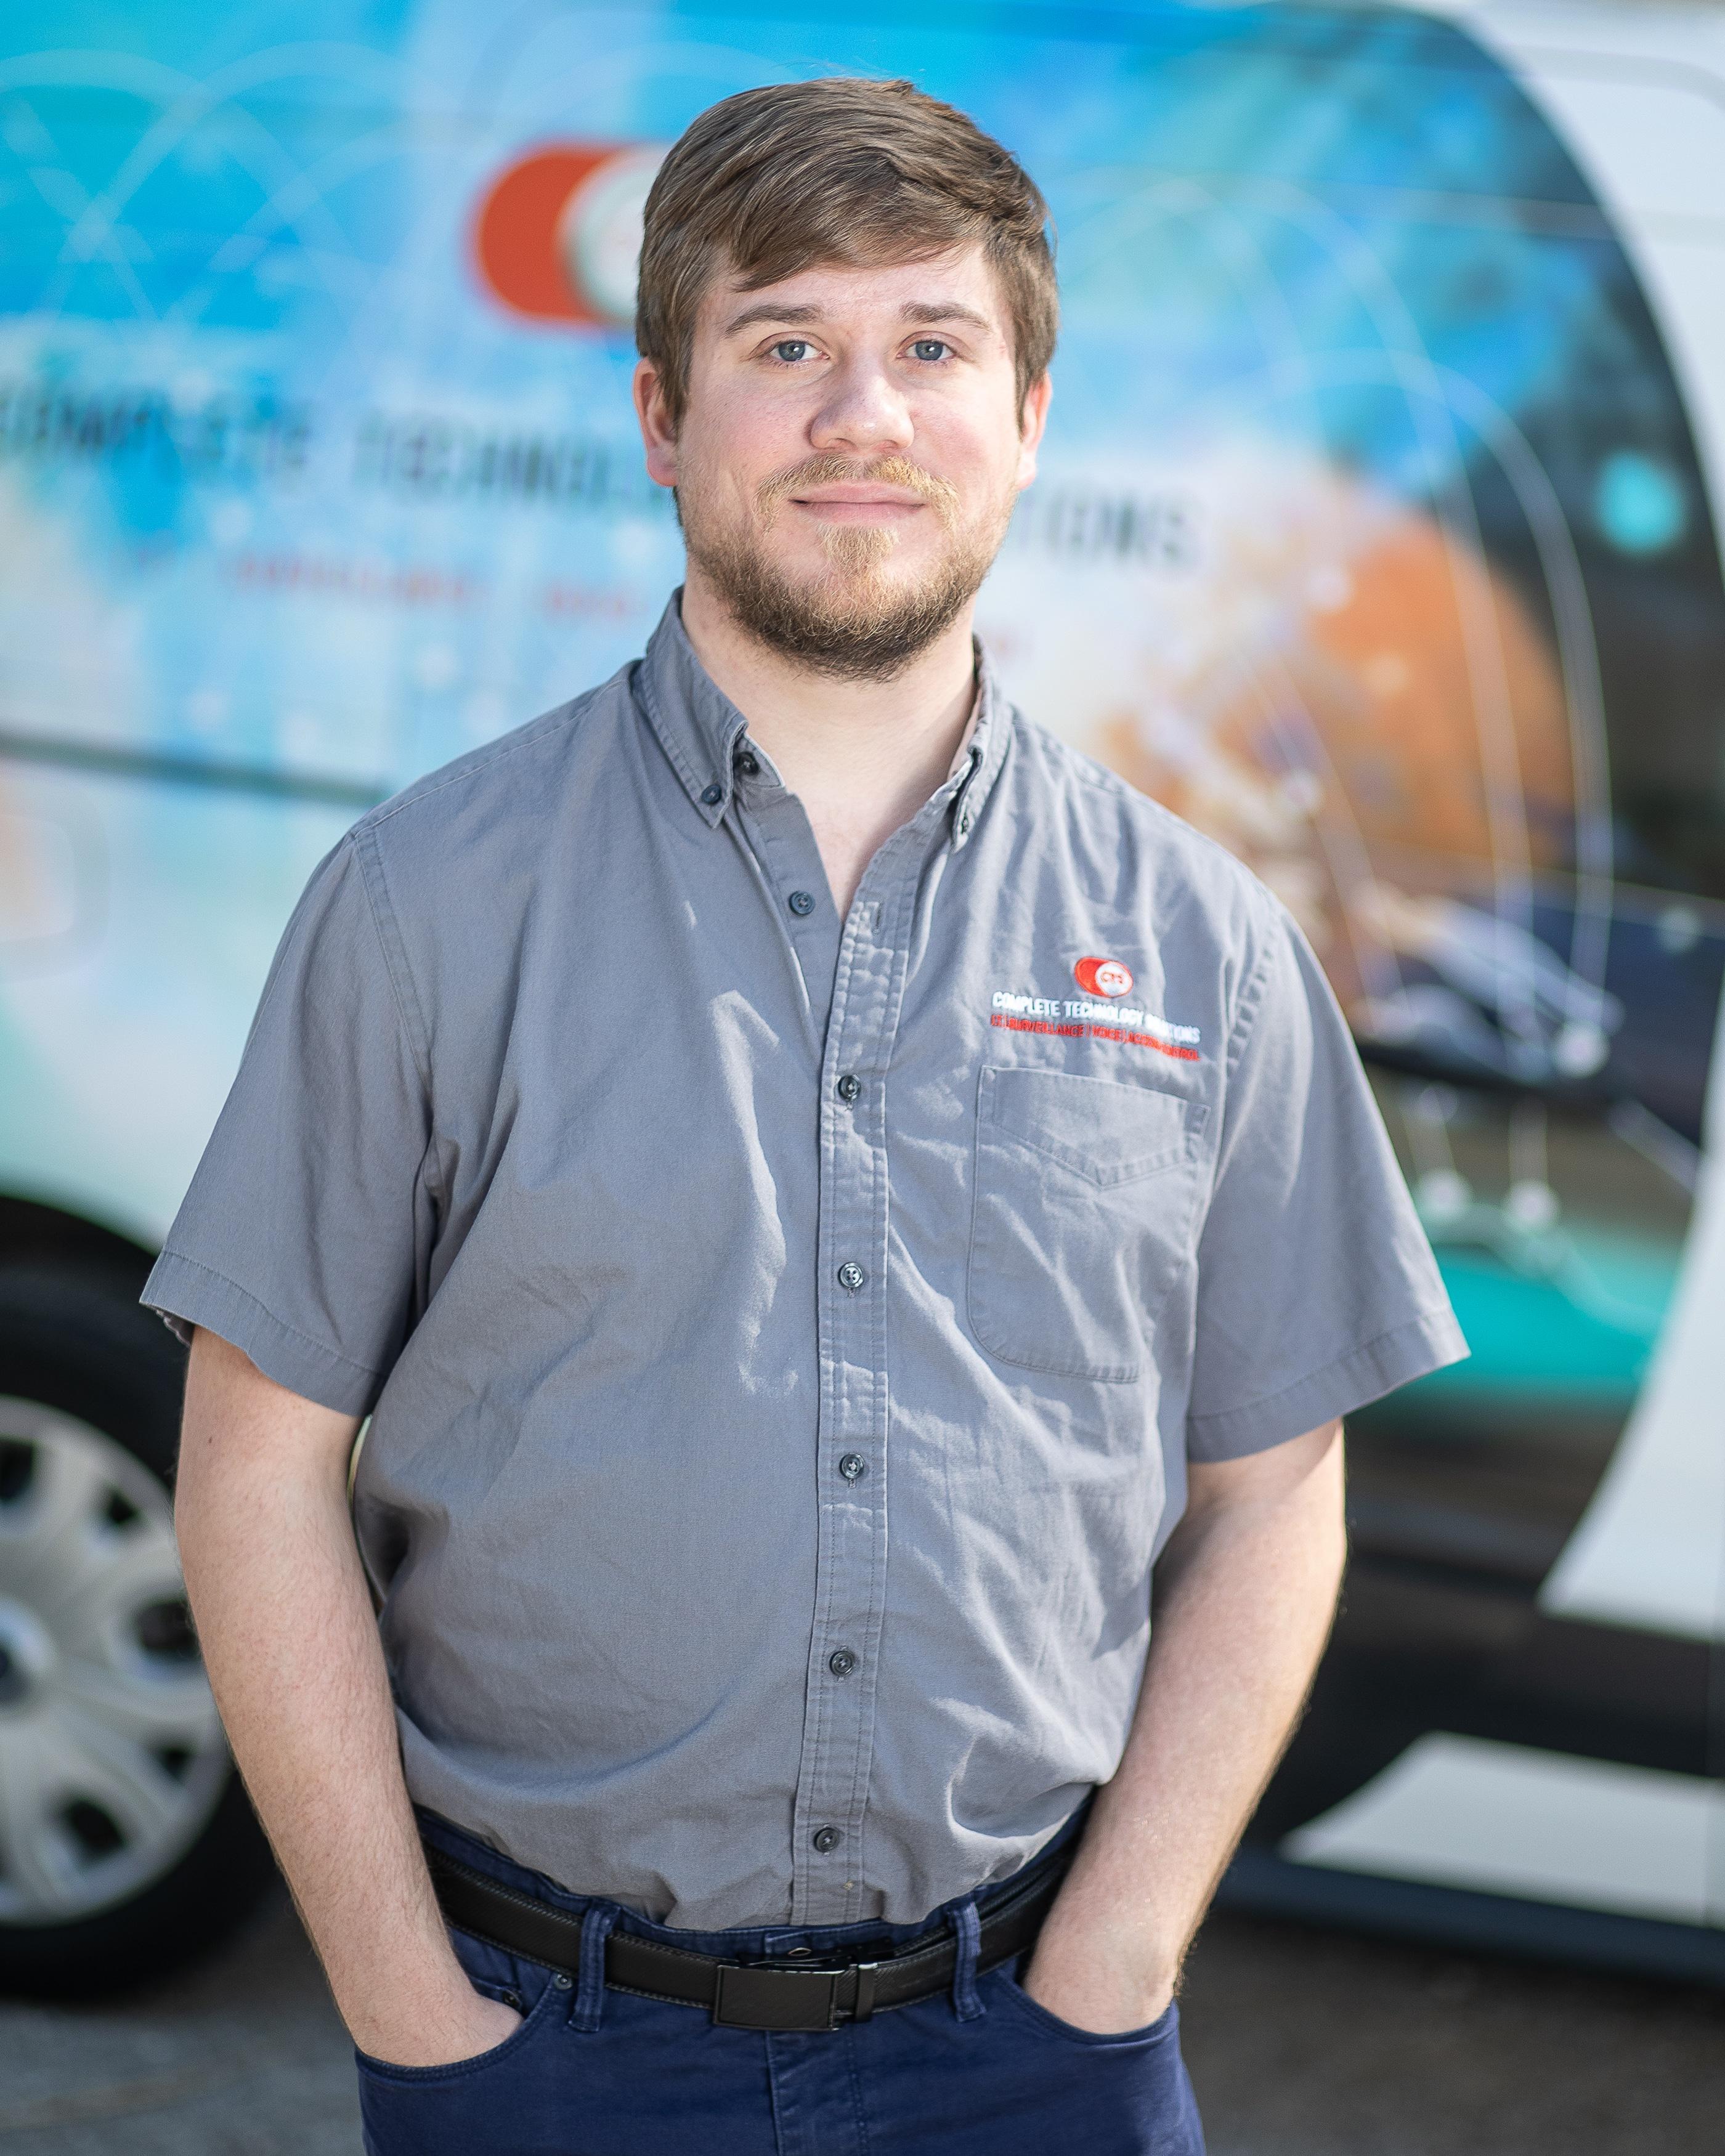 Chris Biondi, CTS Field Technician